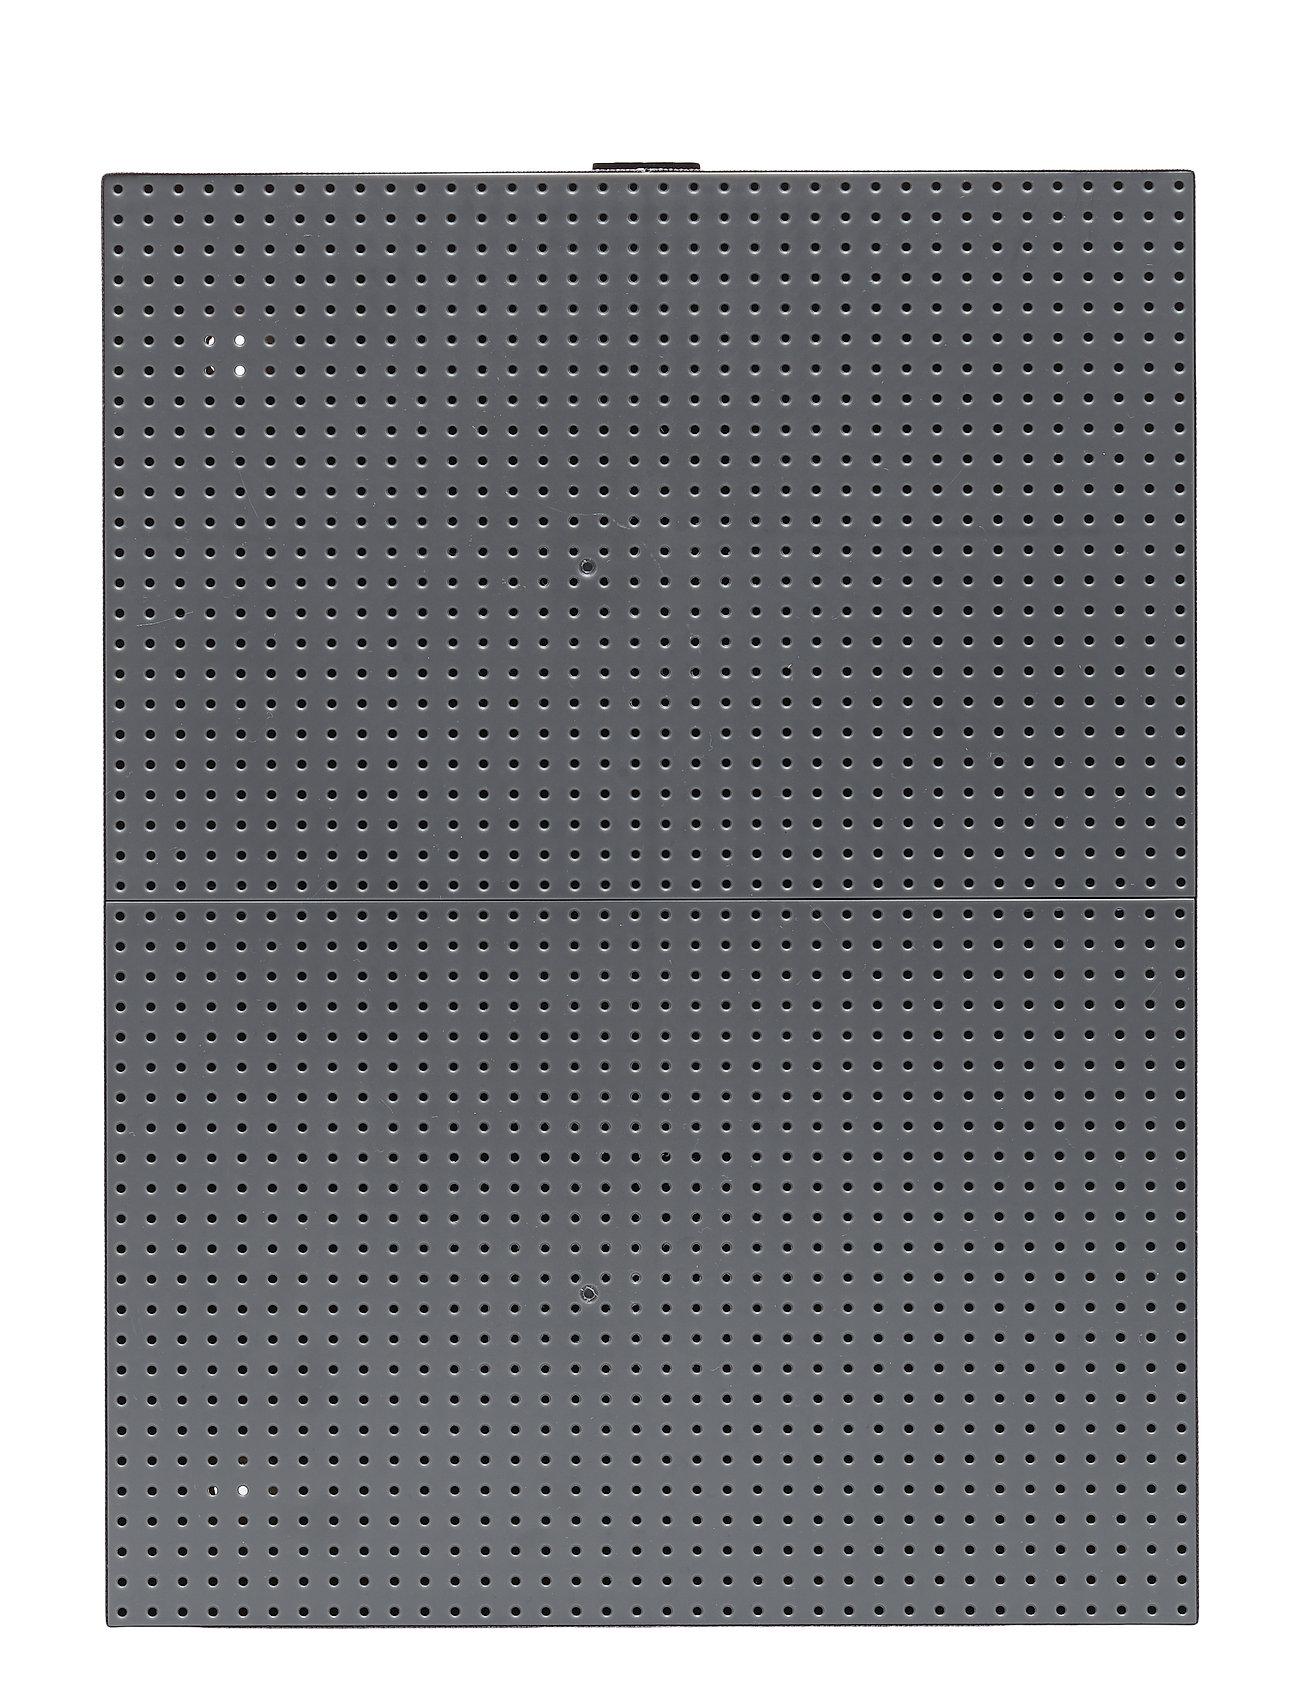 Board Letters Board A4darkgreyDesign Message Letters A4darkgreyDesign Board Message Message 5ARqSLc4j3